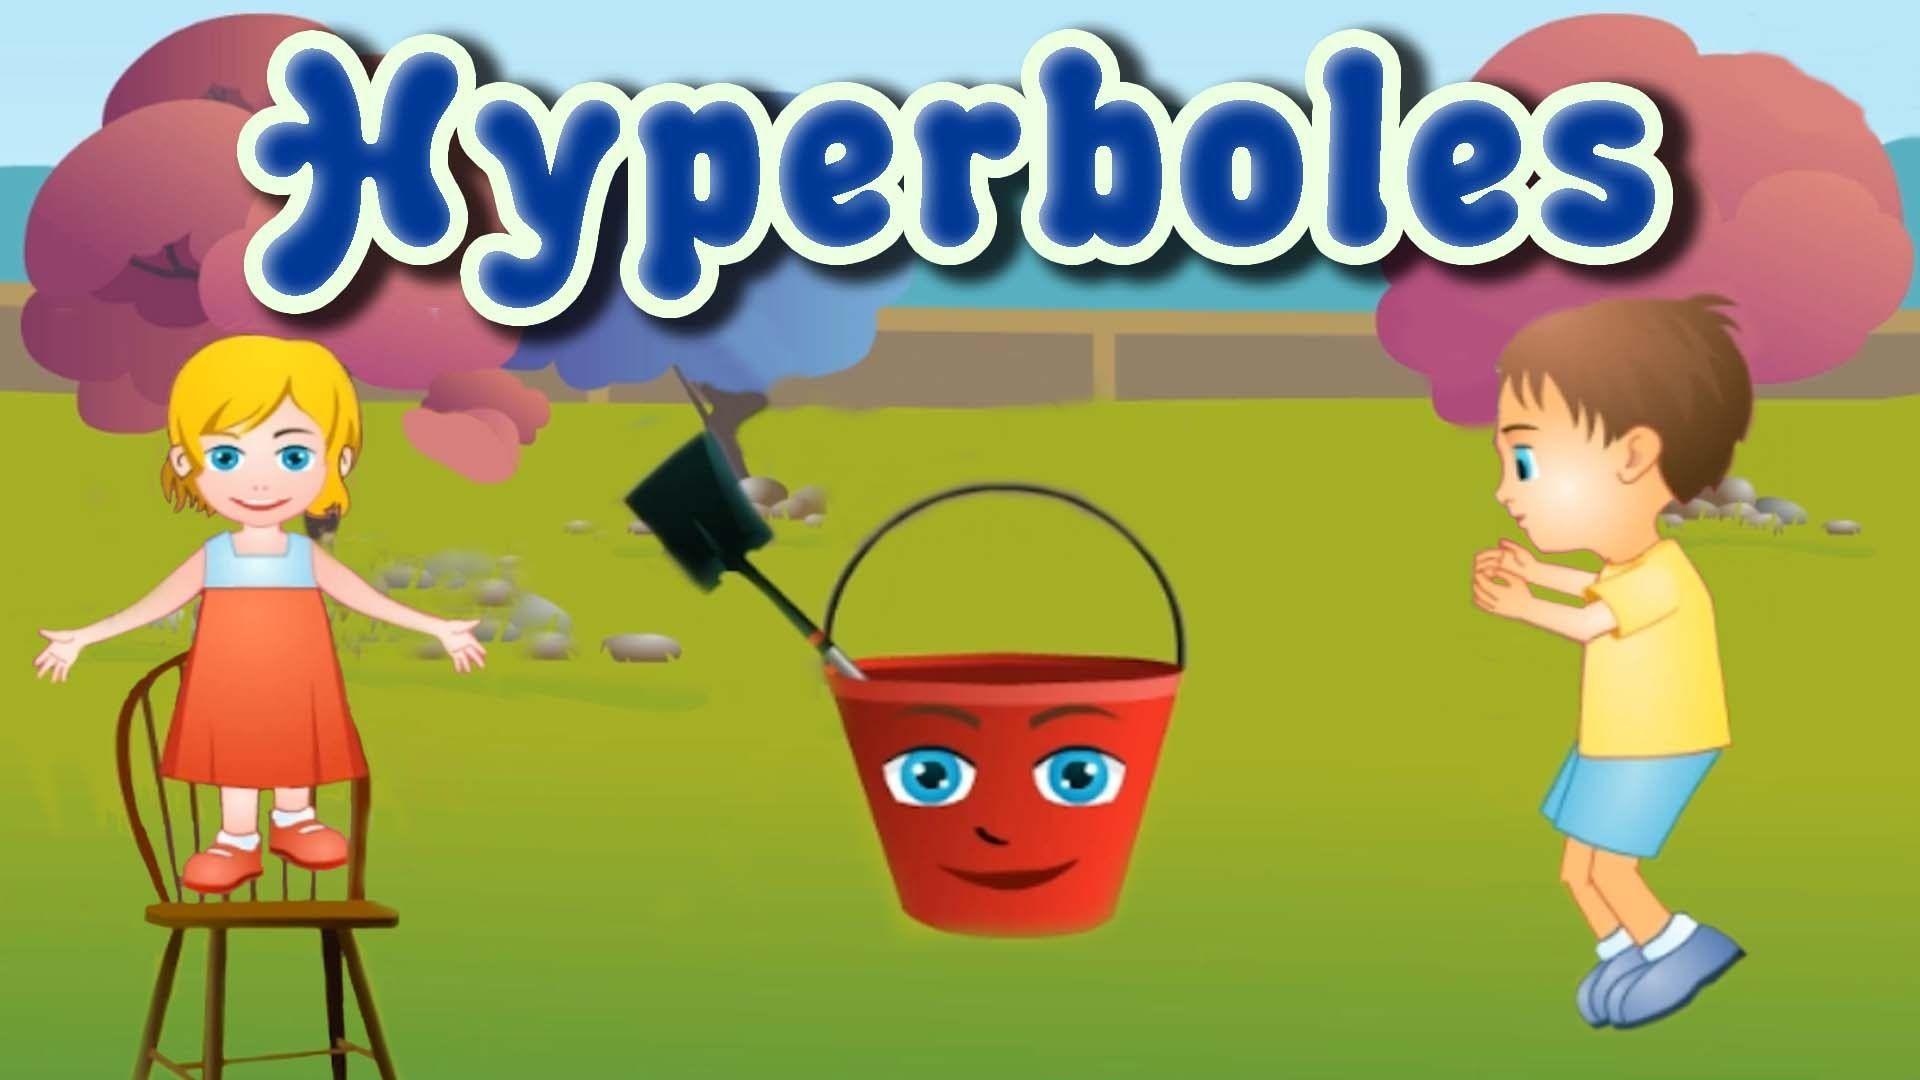 Figurative Language Hyperboles Fun And Educational Game